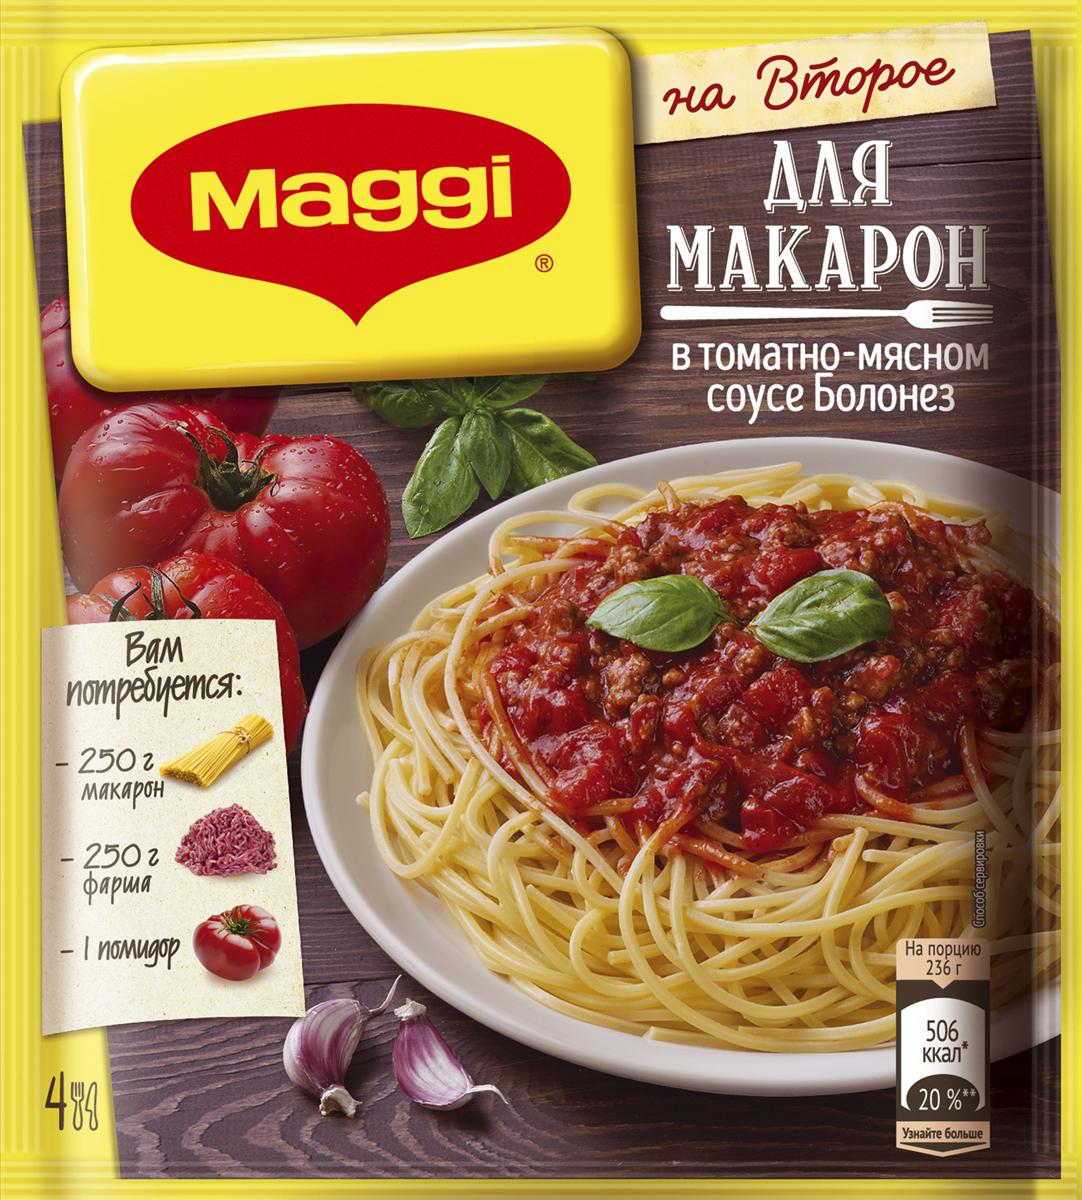 Maggi для макарон в томатно-мясном соусе Болонез, 30 г